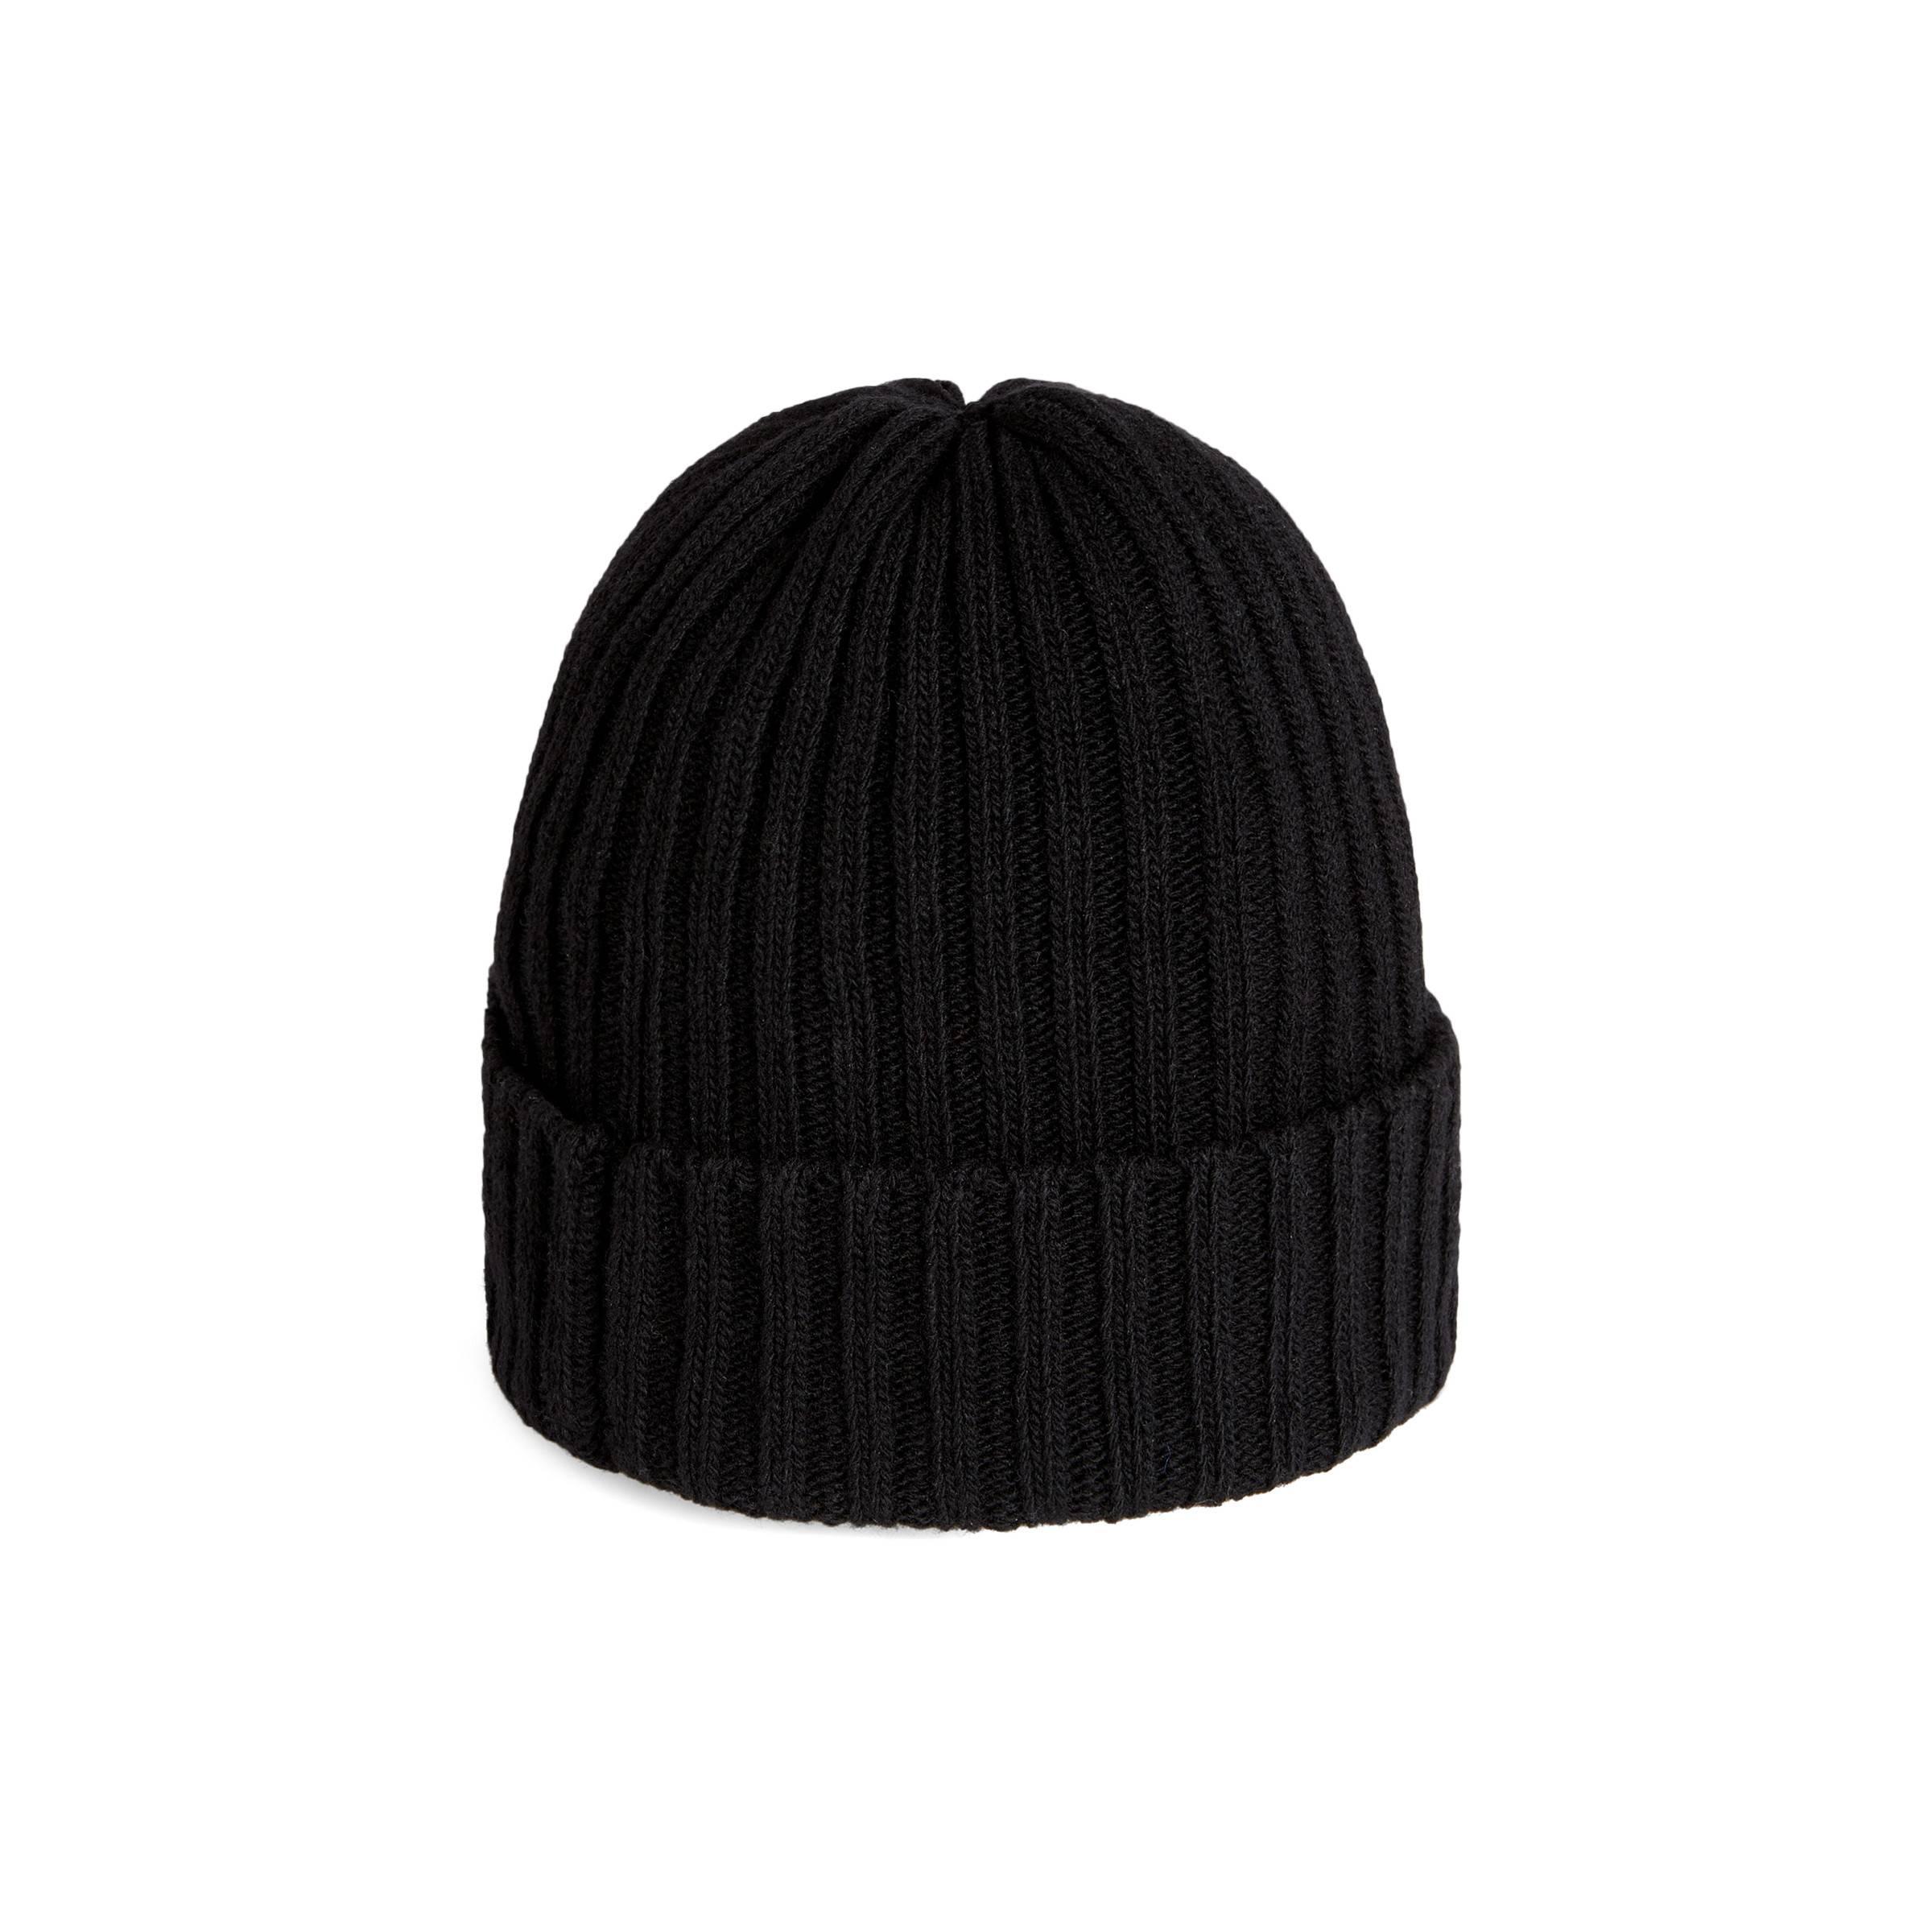 00f62879b26 Gucci Wool Hat With Pierced Heart in Black for Men - Lyst